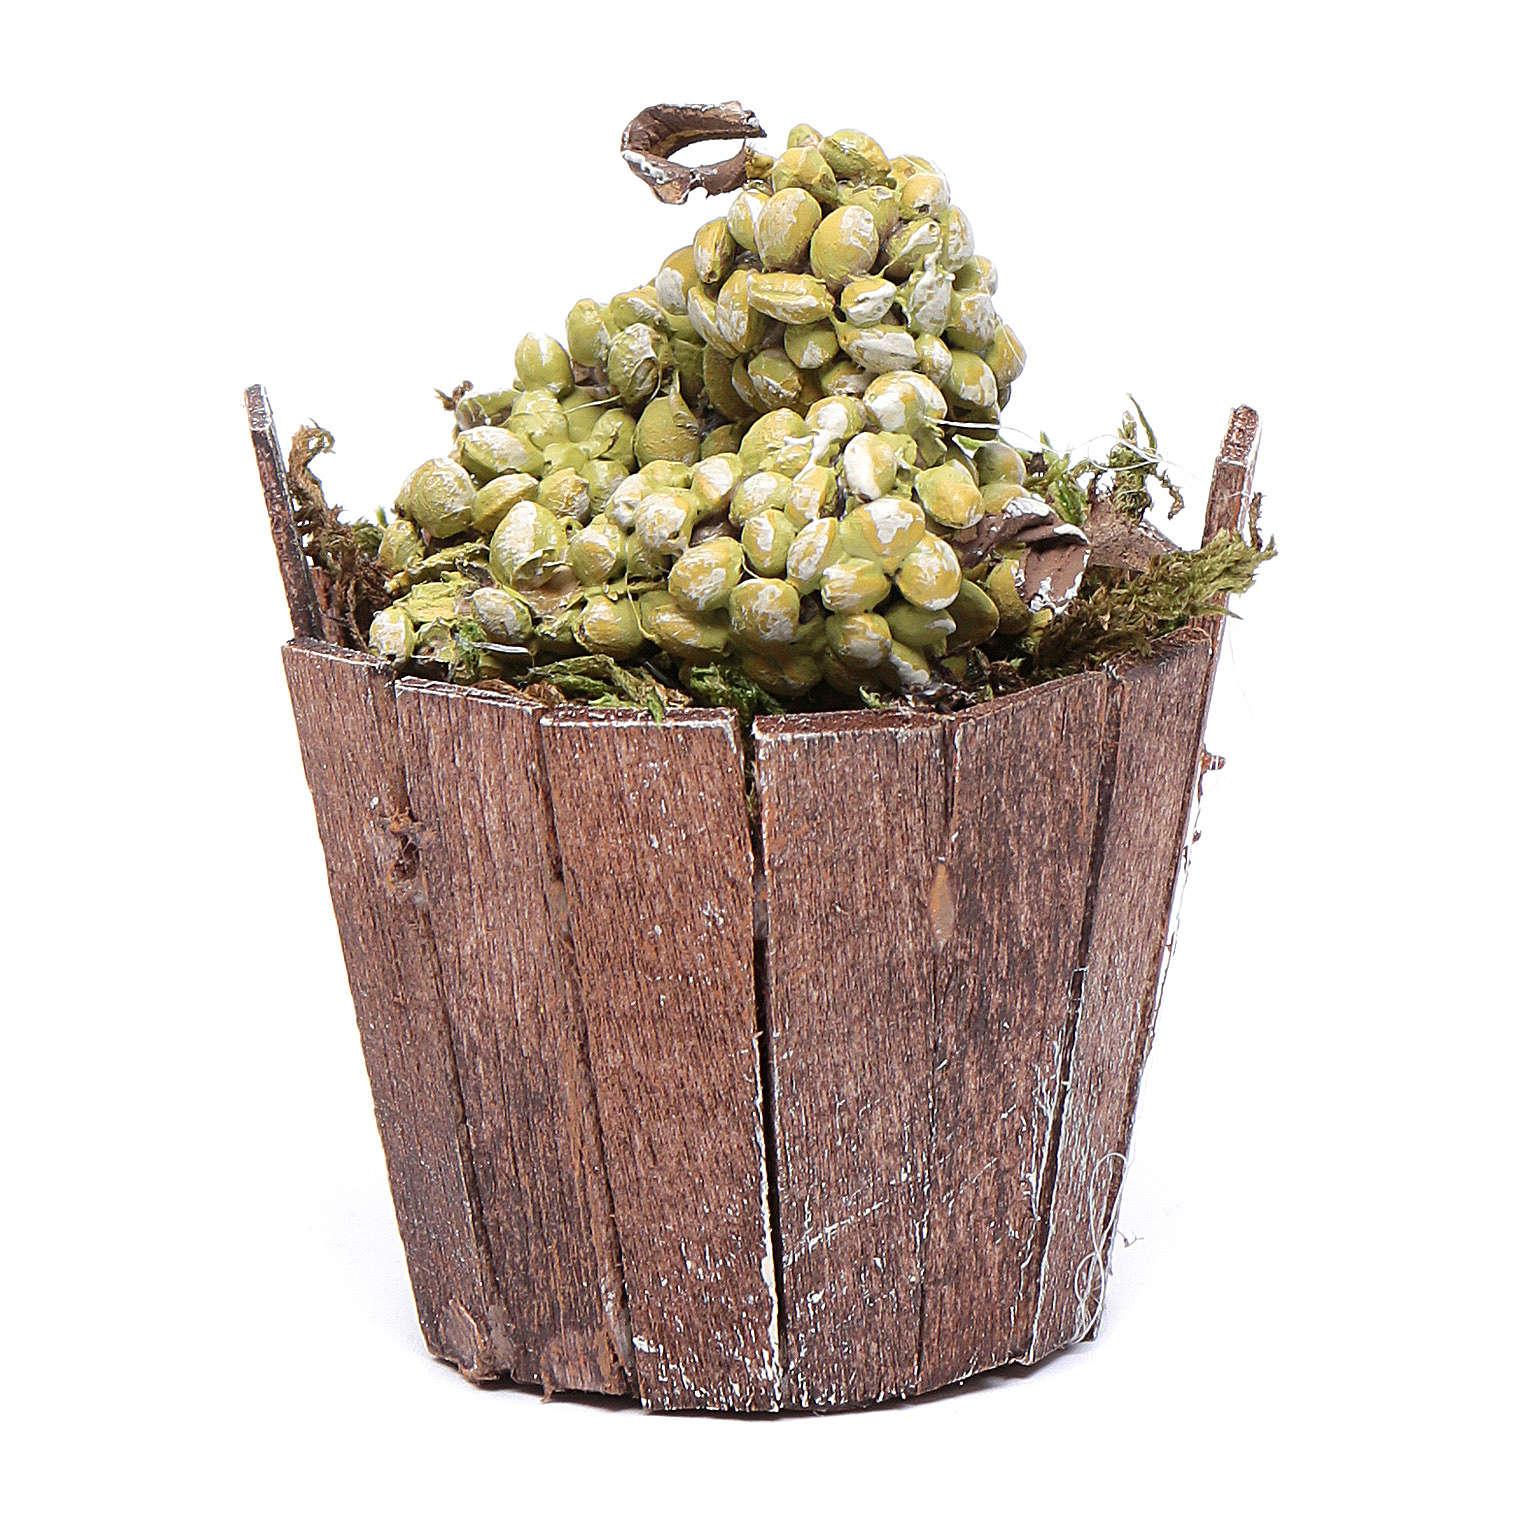 Tinozza uva verde per presepe 7 cm 4